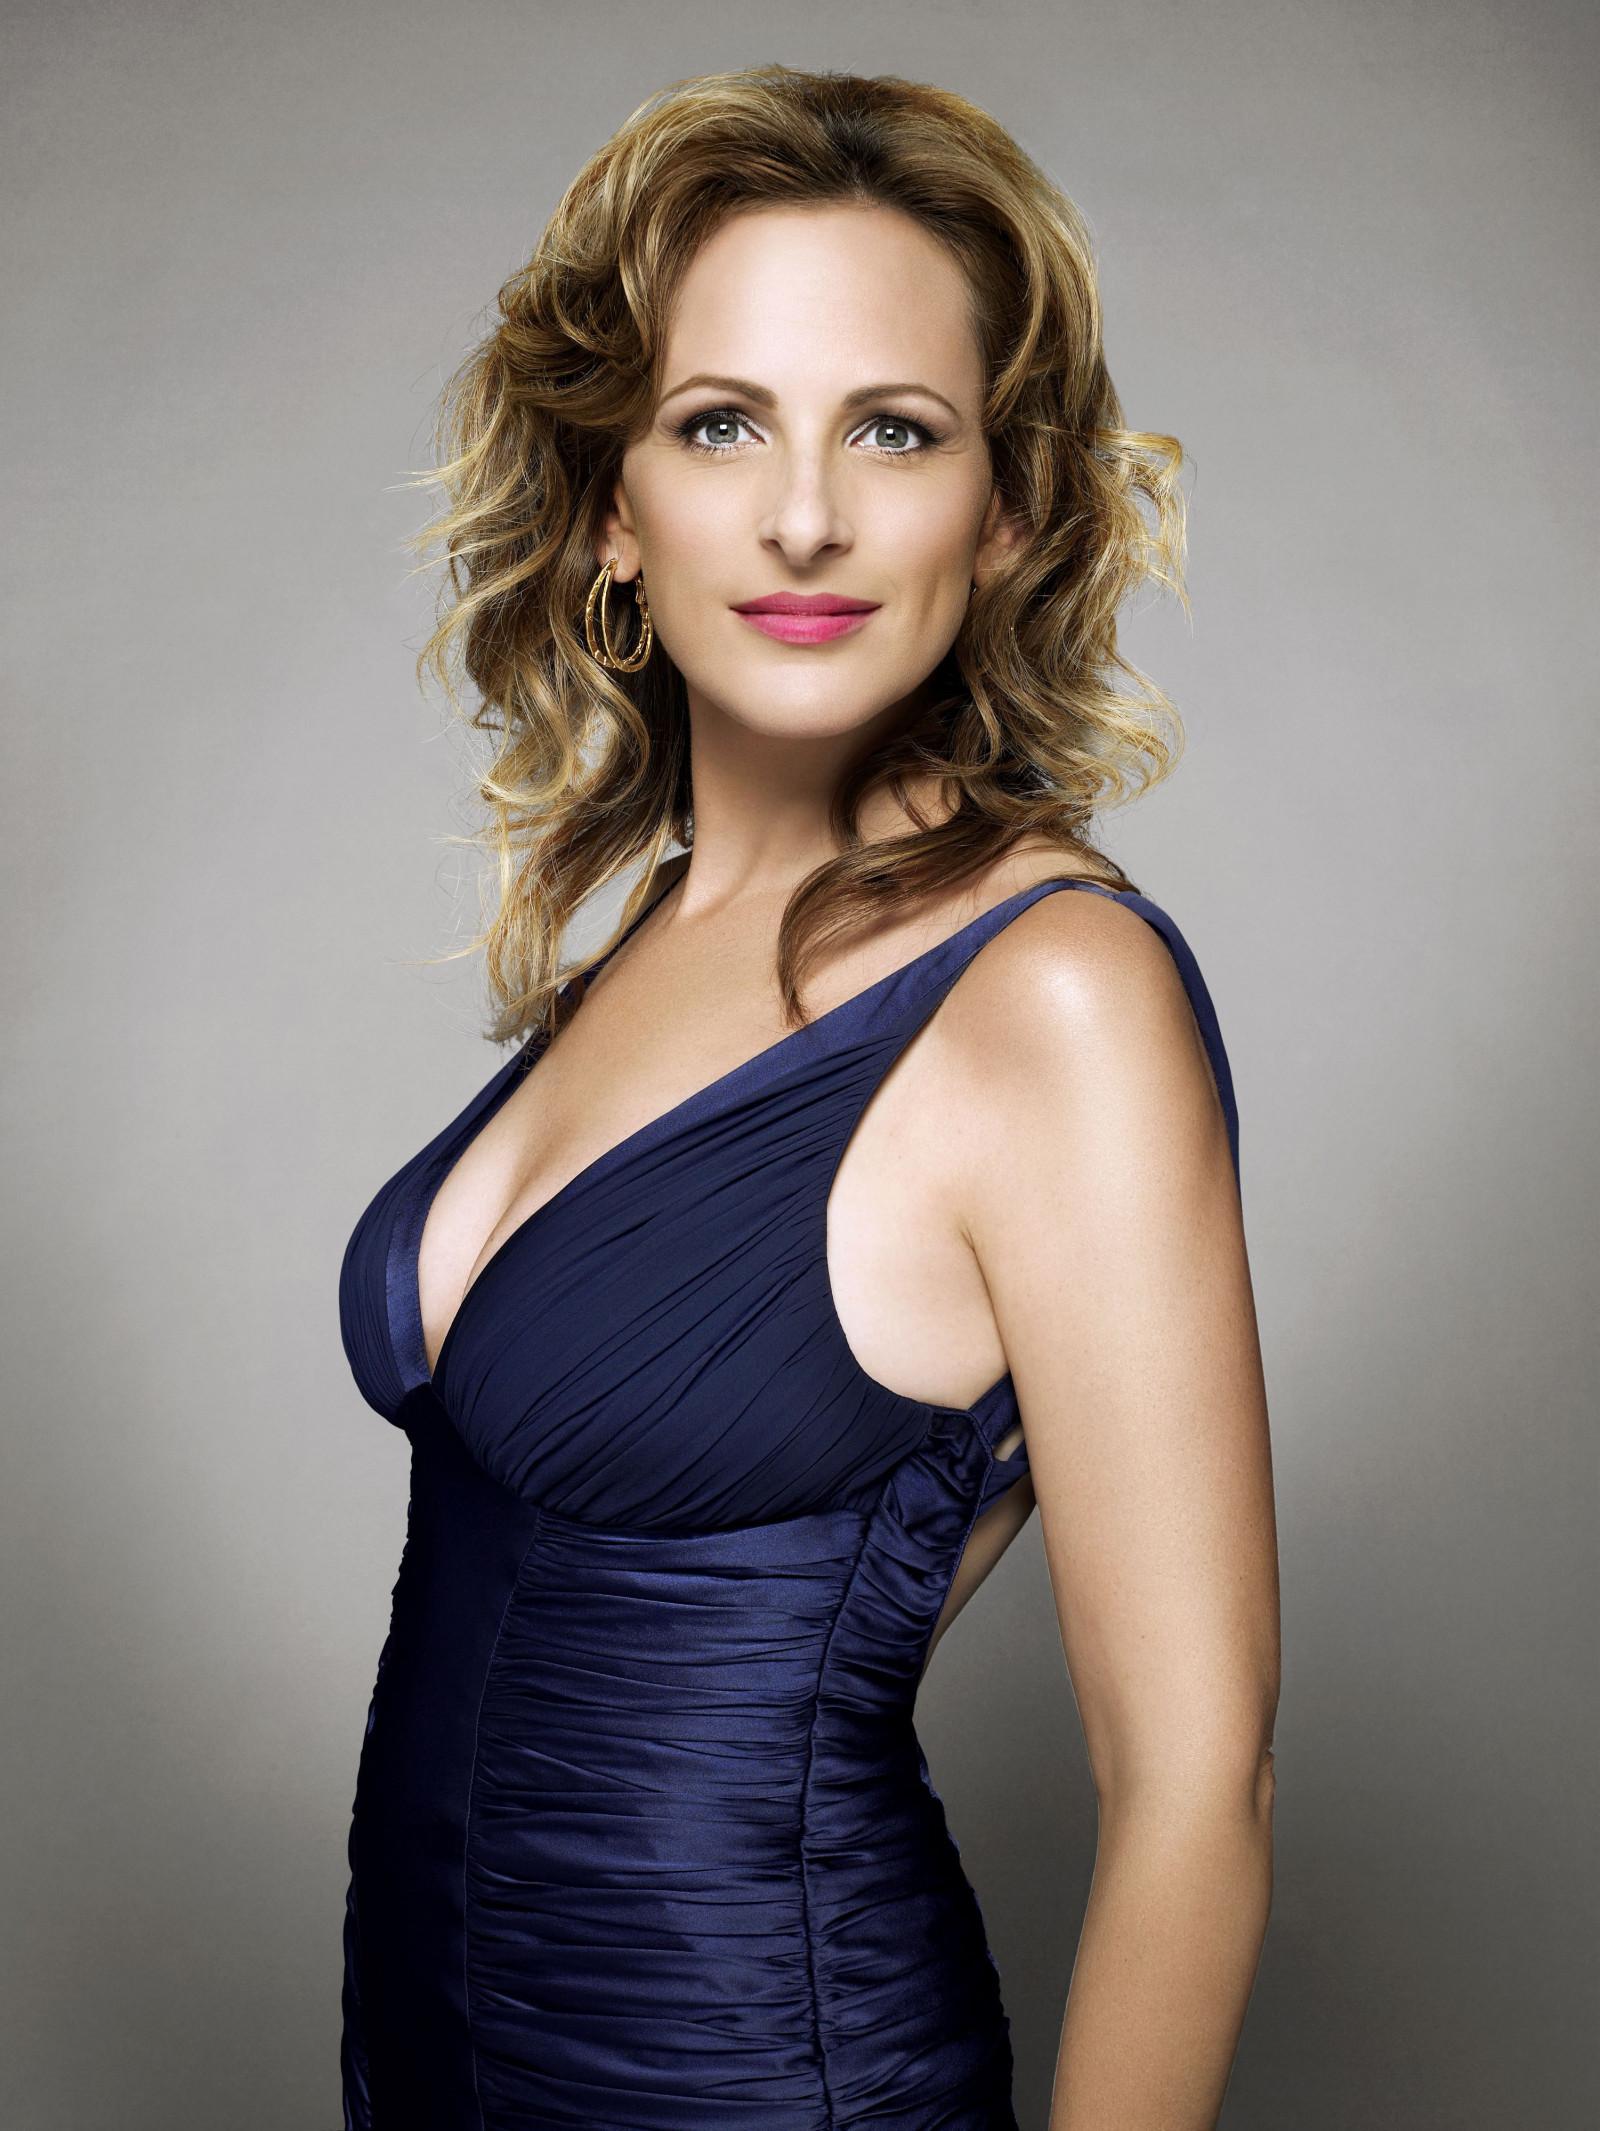 Wallpaper Model Blonde Long Hair Blue Dress Green Eyes Photography Actress